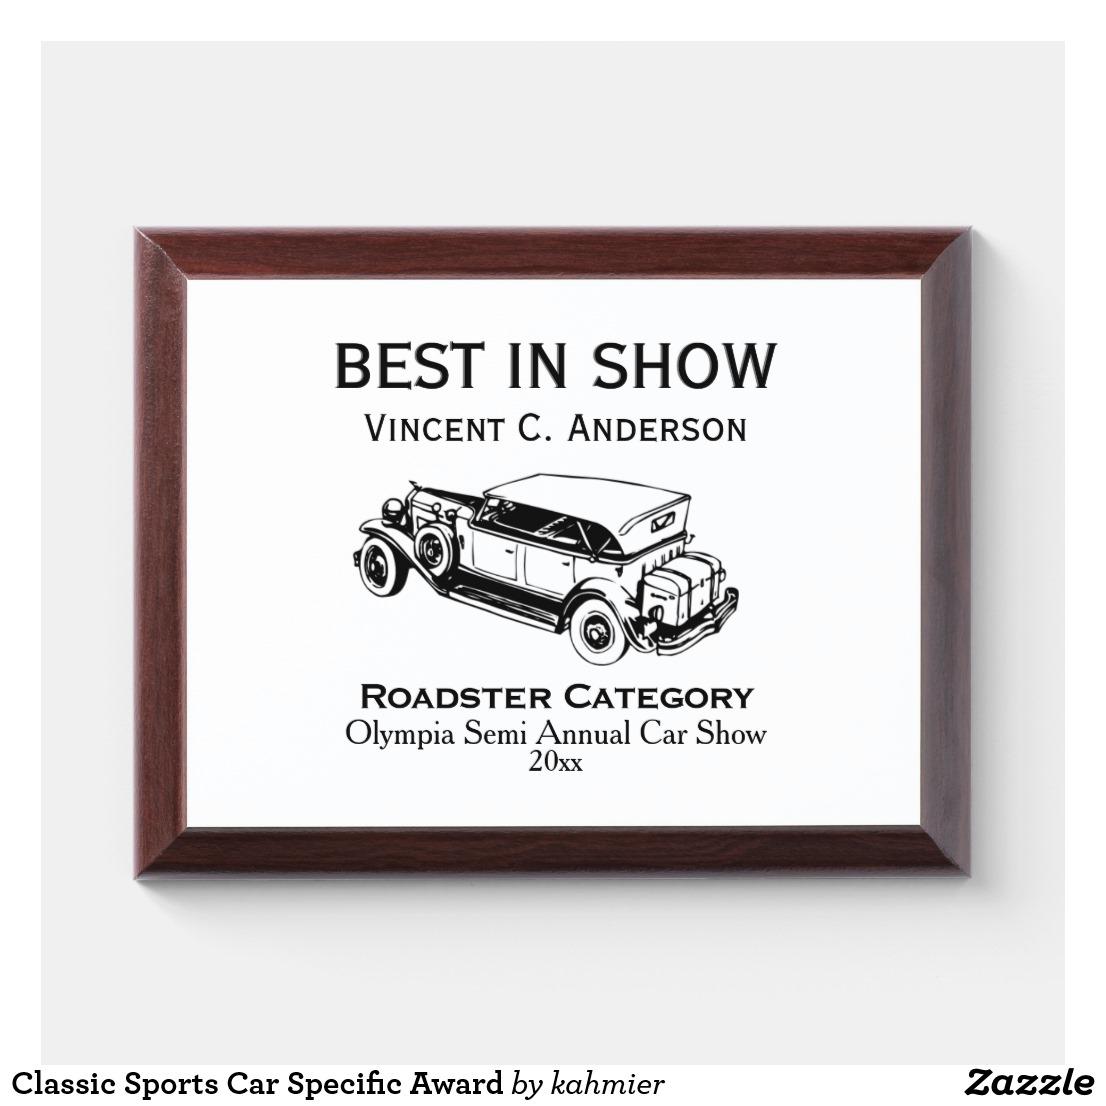 Classic Sports Car Award